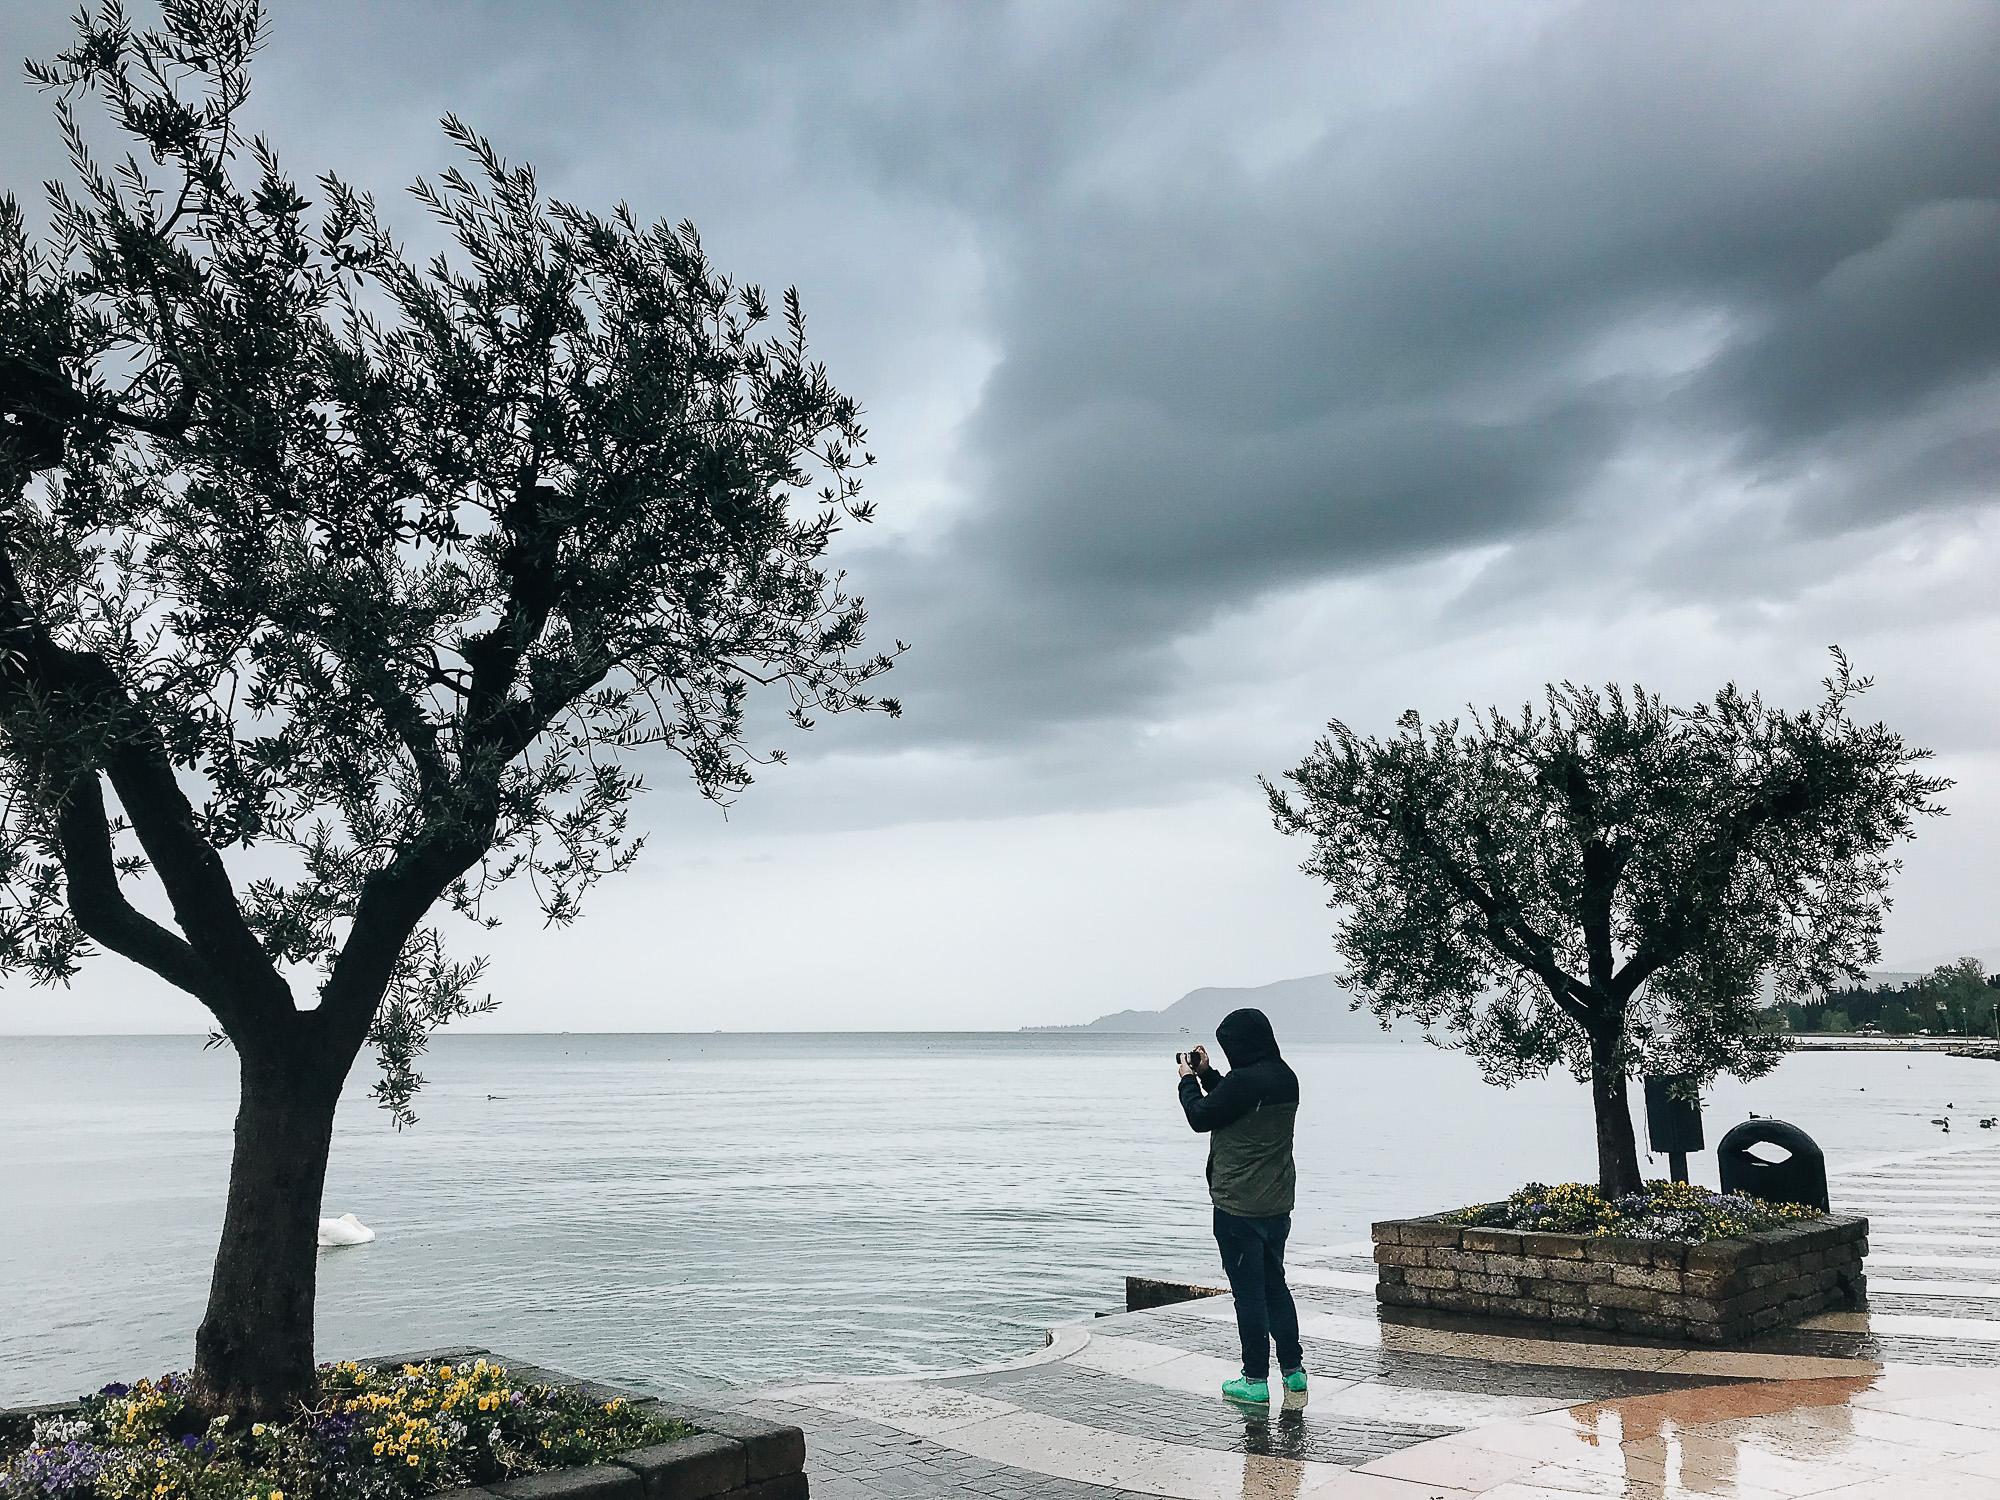 OurBeautifulAdventure-LakeGarda-Italy-Blog-6082.jpg